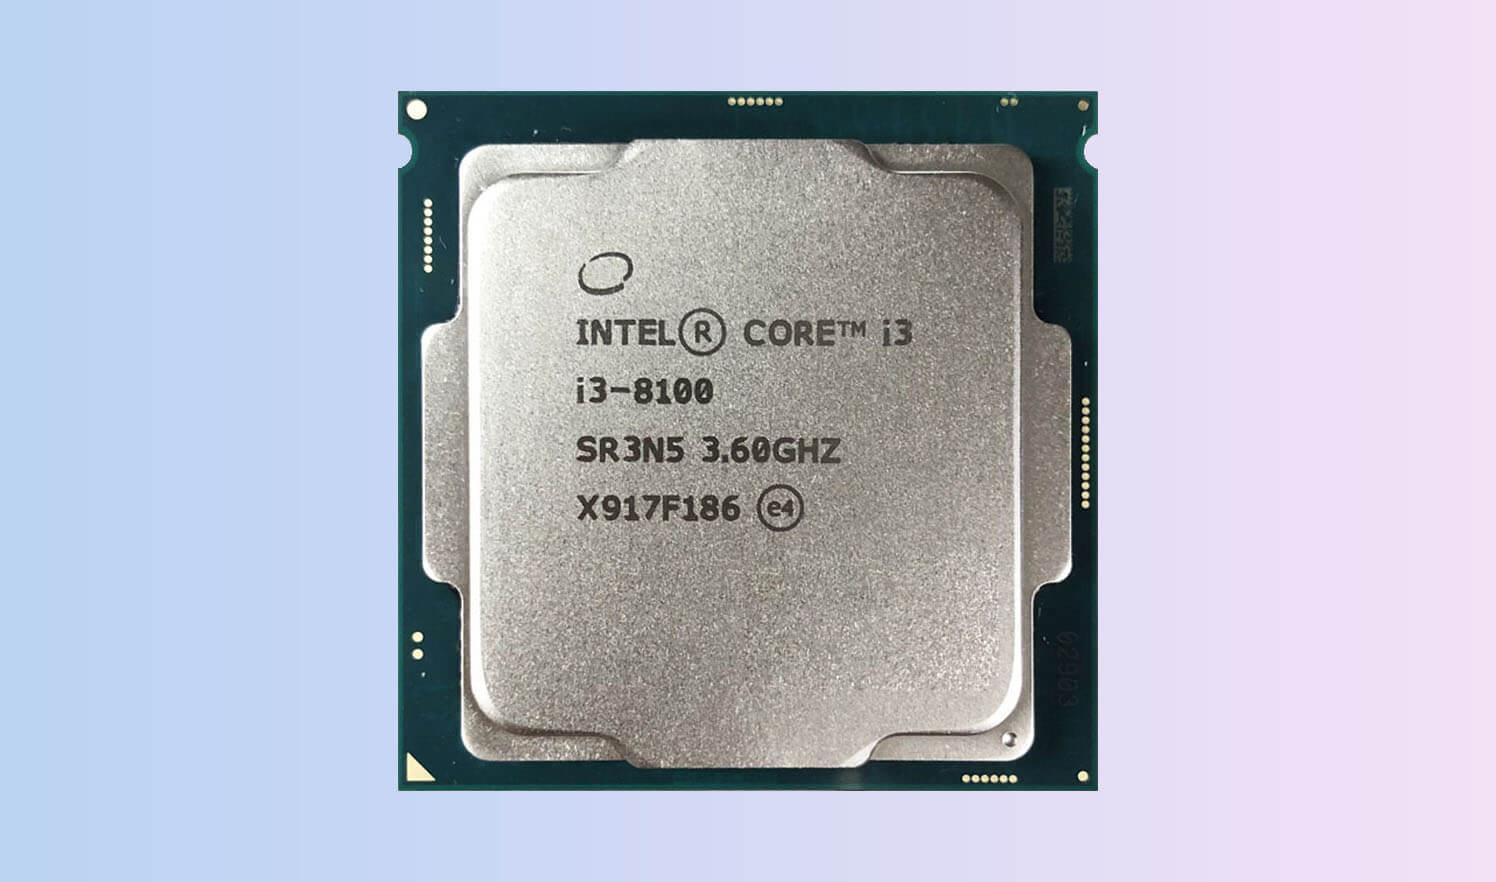 LGA 1151 CPUs List for LGA 1151 V2 Motherboards (Cofee Lake)